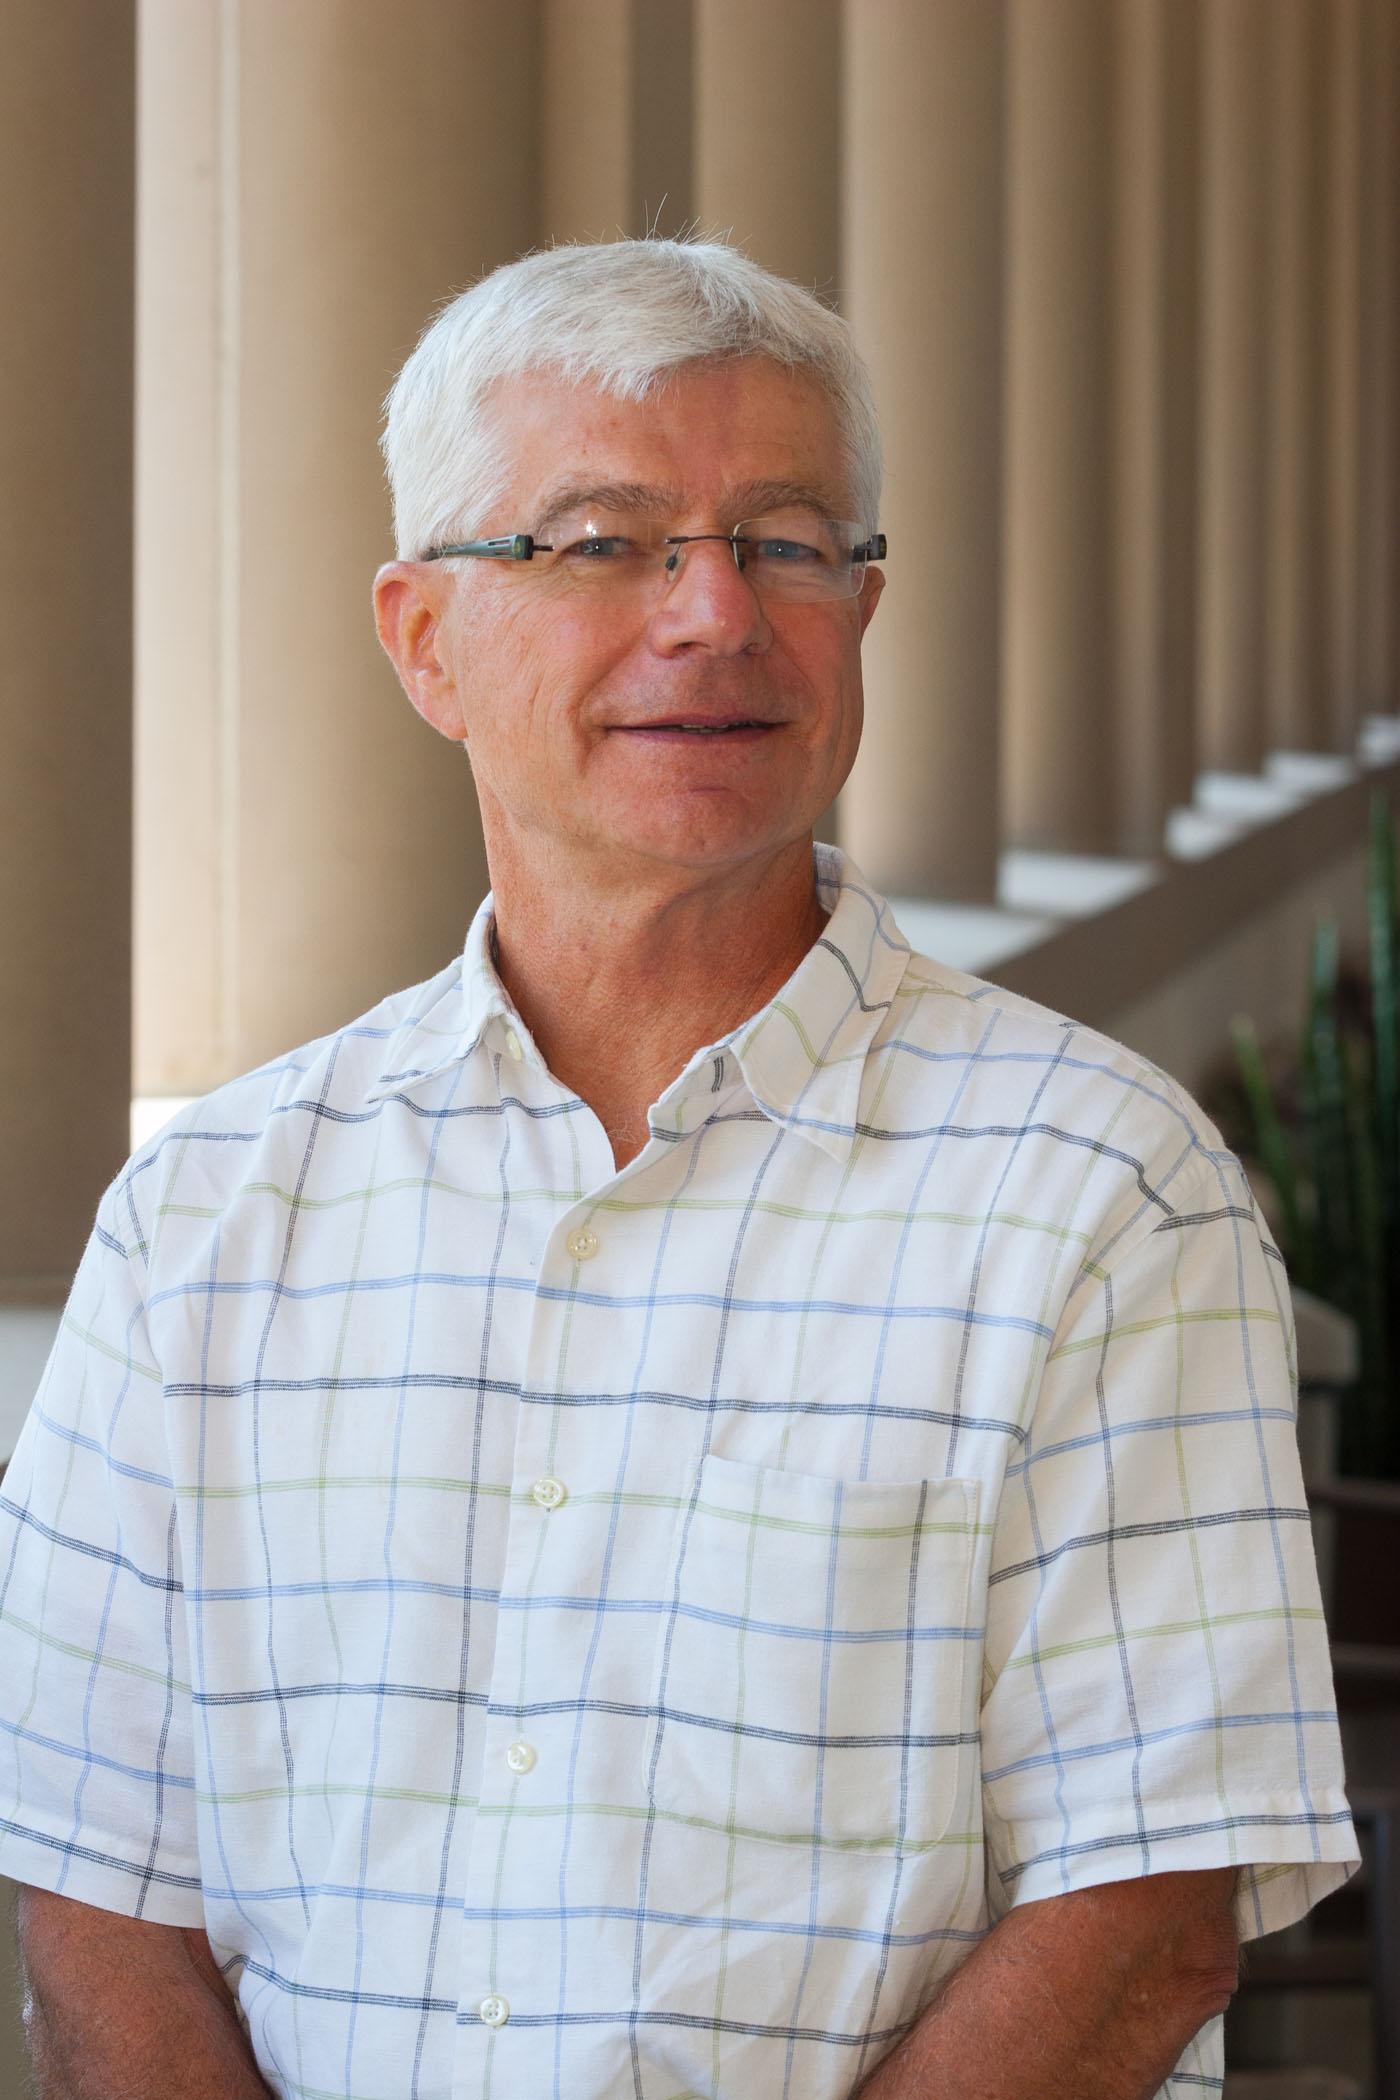 Daniel A. Mazmanian, Academic Director